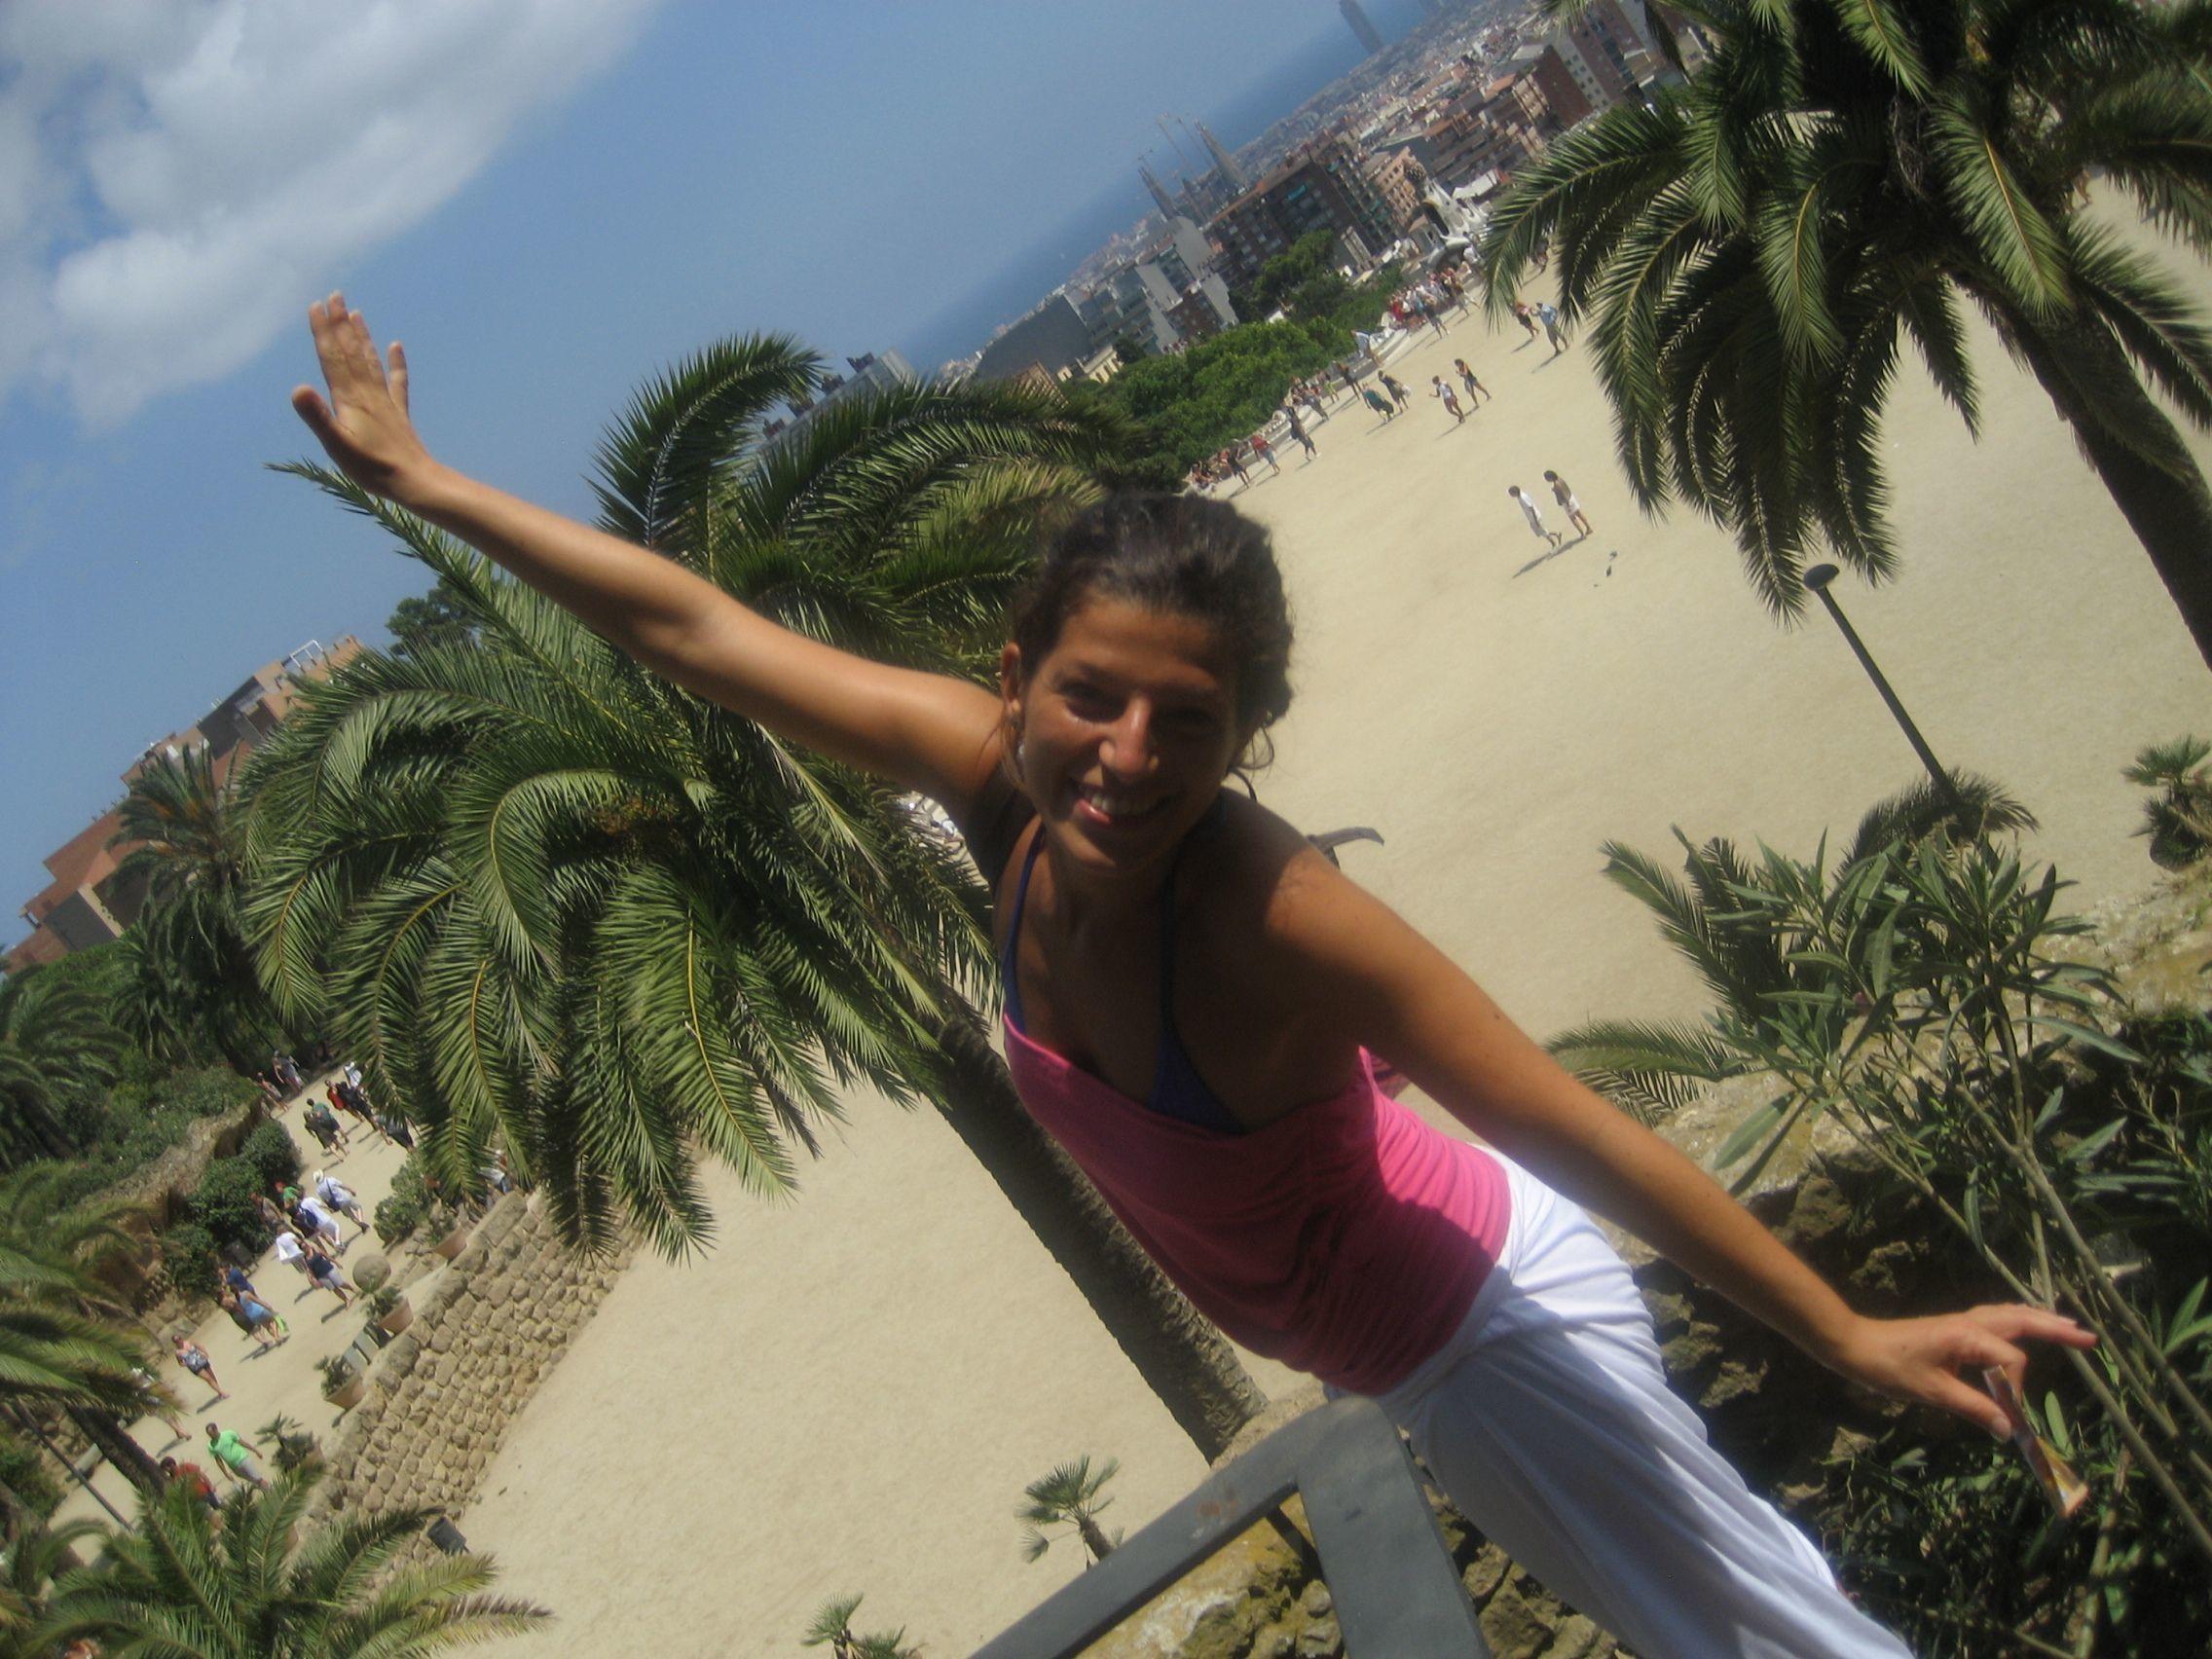 Daniela - The Orange County Brazilian Portuguese Meetup Group (Costa